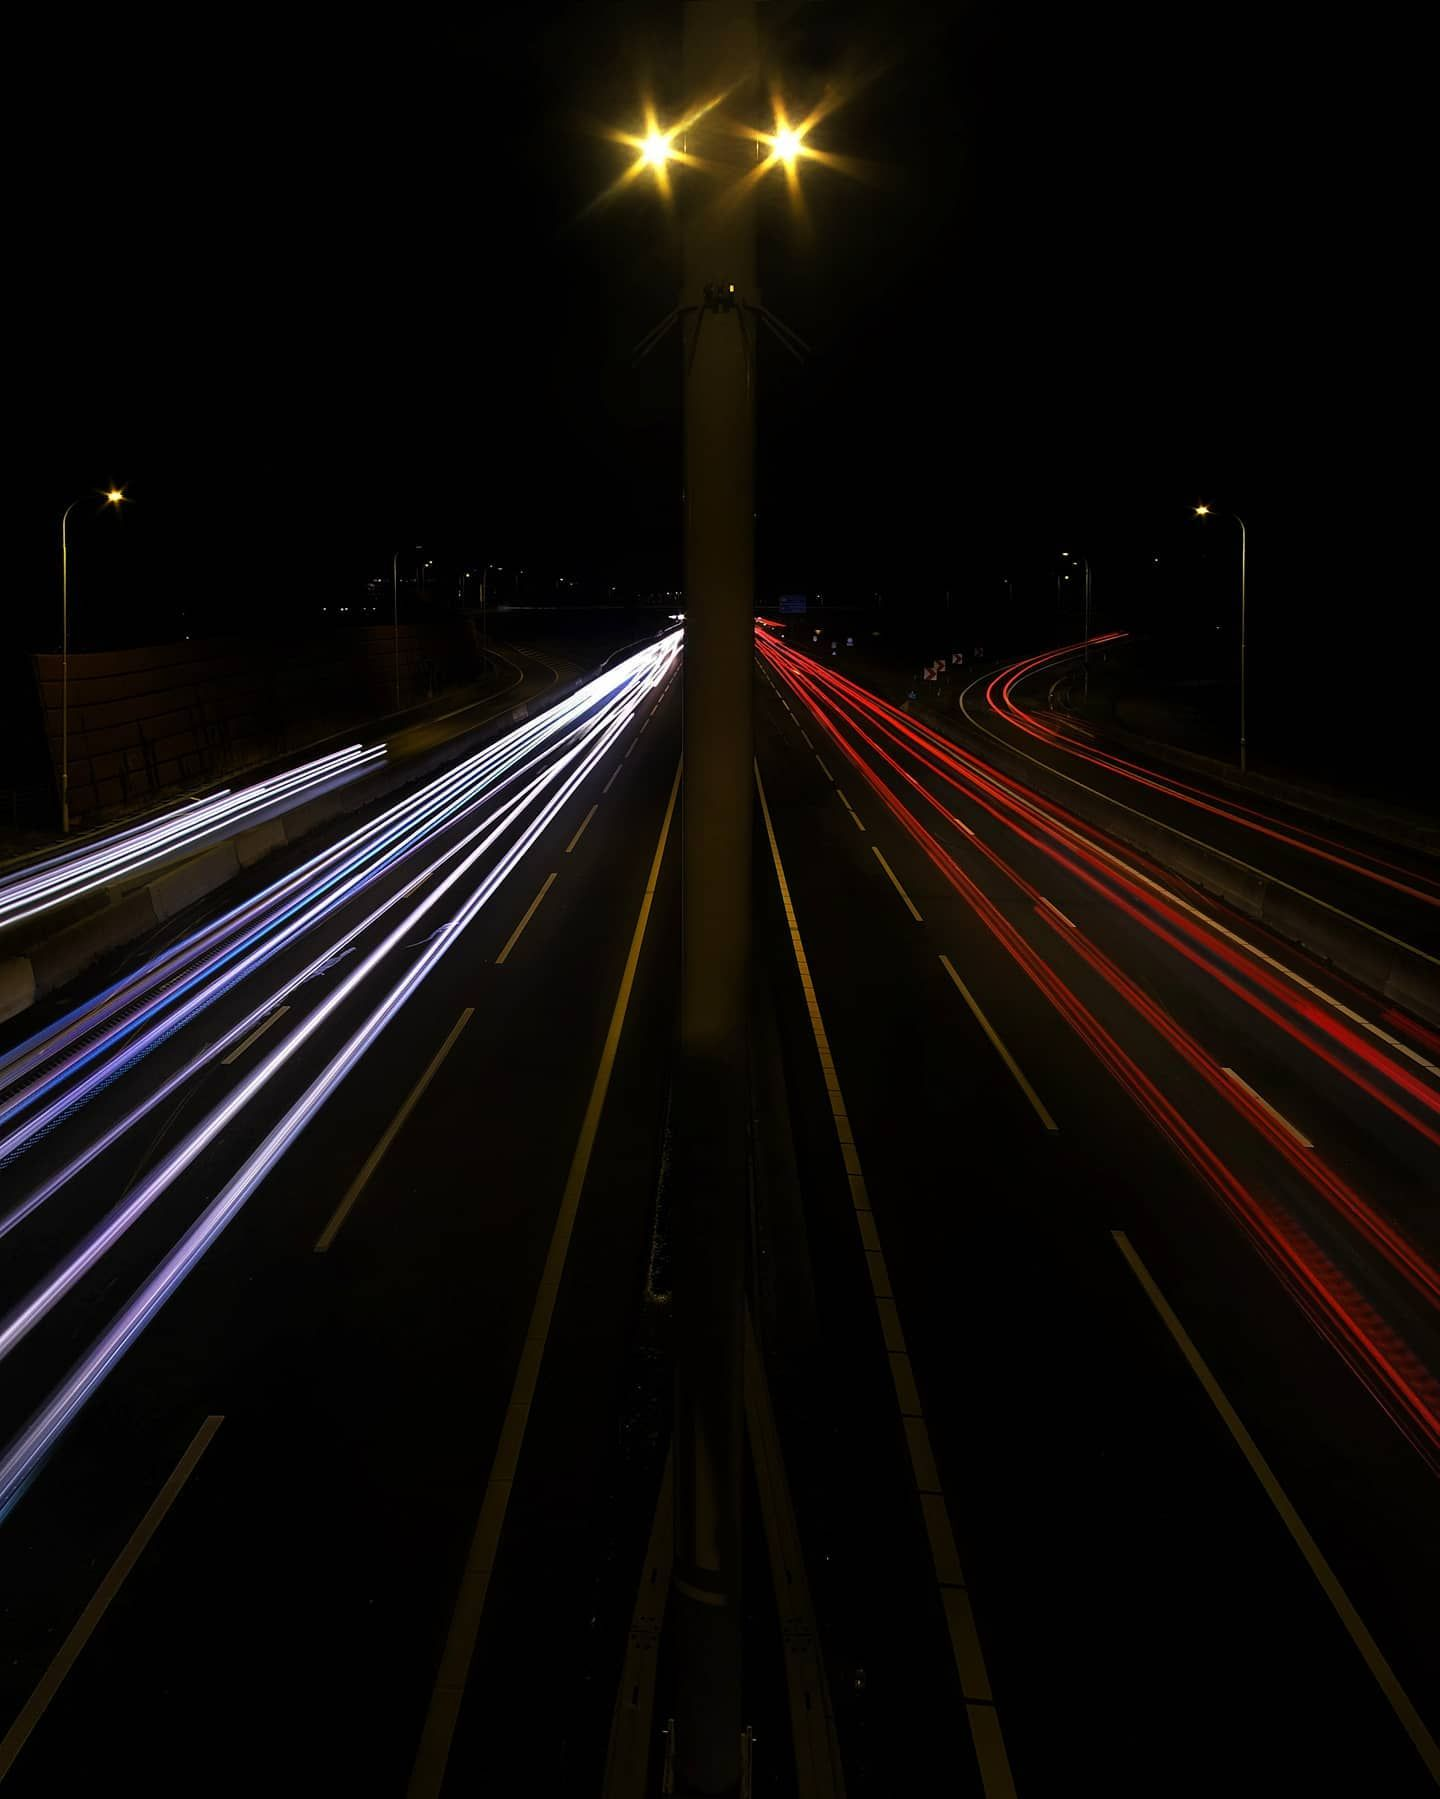 Sight of Light   A28  Fujifilm X-T20  Samyang 12mm/2   ƒ/11   15s   12 mm   ISO200  A28 Highway Amersfoort  29th of March 2019 . . . . . . . @samyanglensglobal #samyanglensglobal @samyangbenelux #samsungbenelux #fujifilmnederland #nightsight #snapseeddaily #slowshutters #slowshutterspeed #fujixlovers @fujixlovers #lighttrailphotography #fujifeed @photowalkglobal @yourvisualdiarys @natgeoyourshot #natgeoyourshot @ourfotoworld #shotonfuji #zoomnl #lightsatnight #cameranunl #ultrawide #yourshotphot